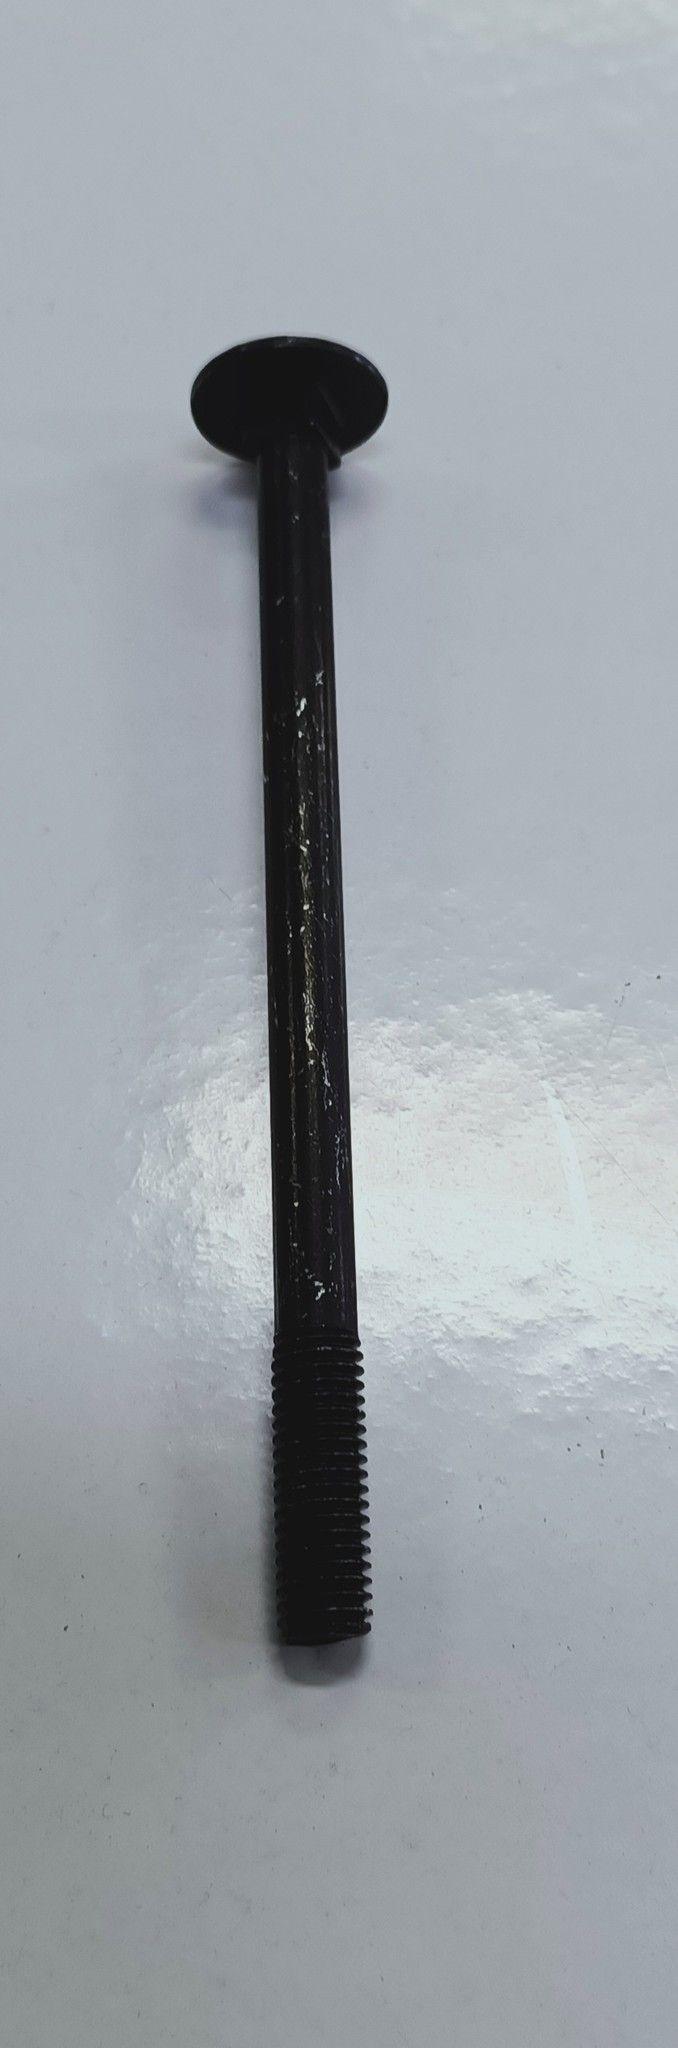 Bullone mm  8 x120 testa tonda quadro sotto testa nero